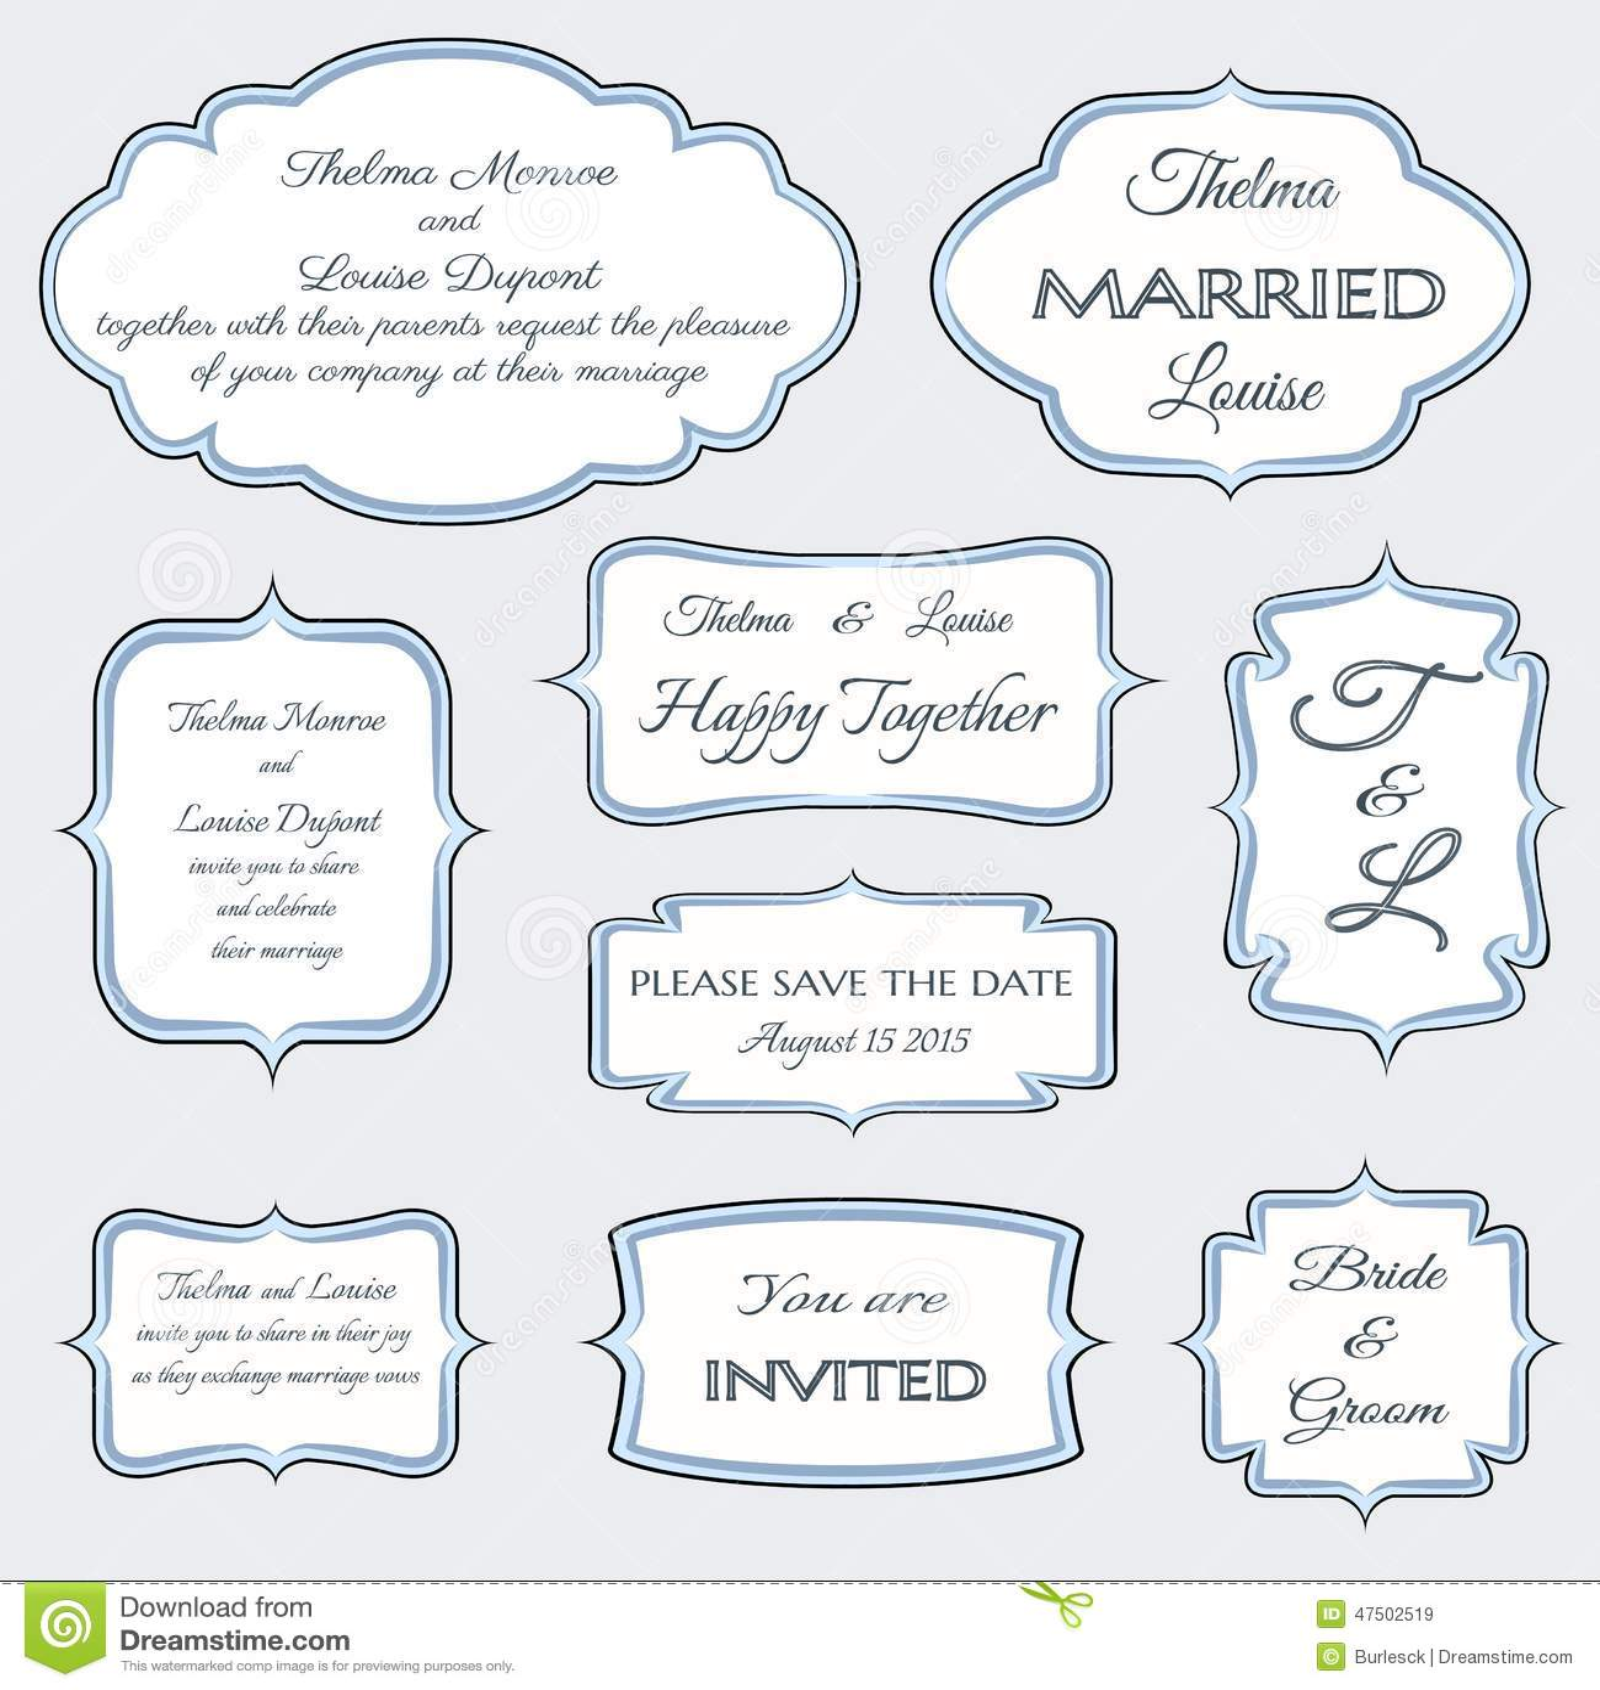 Traditional Wedding Invitation is amazing invitations example